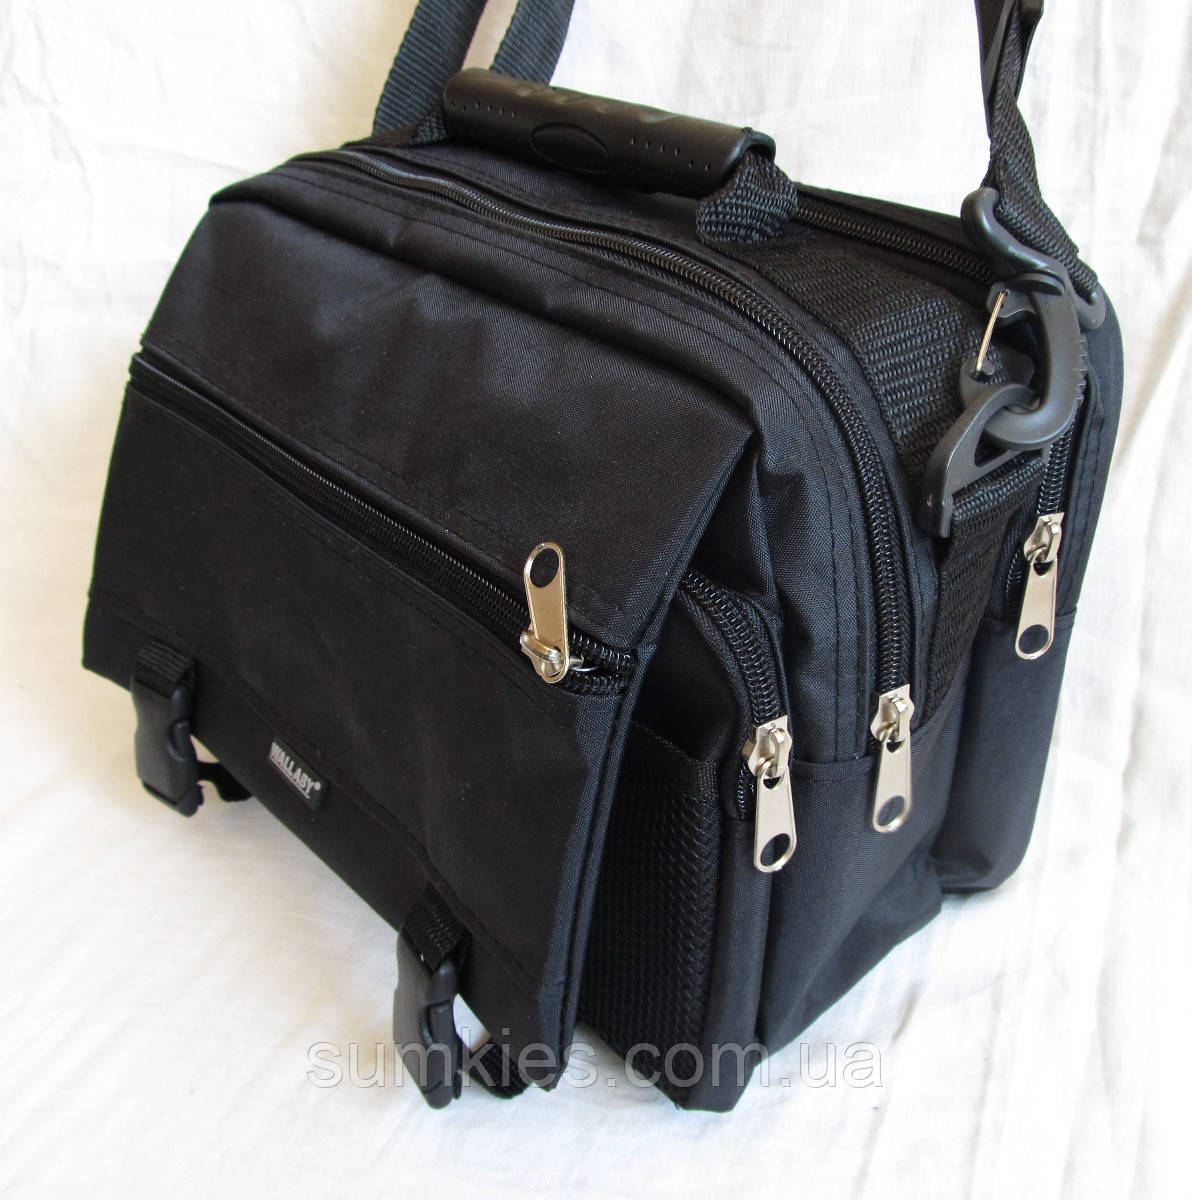 1c83fb9d96aa Мужская сумка Wallaby2425 черная барсетка через плечо 28х21х16см ...